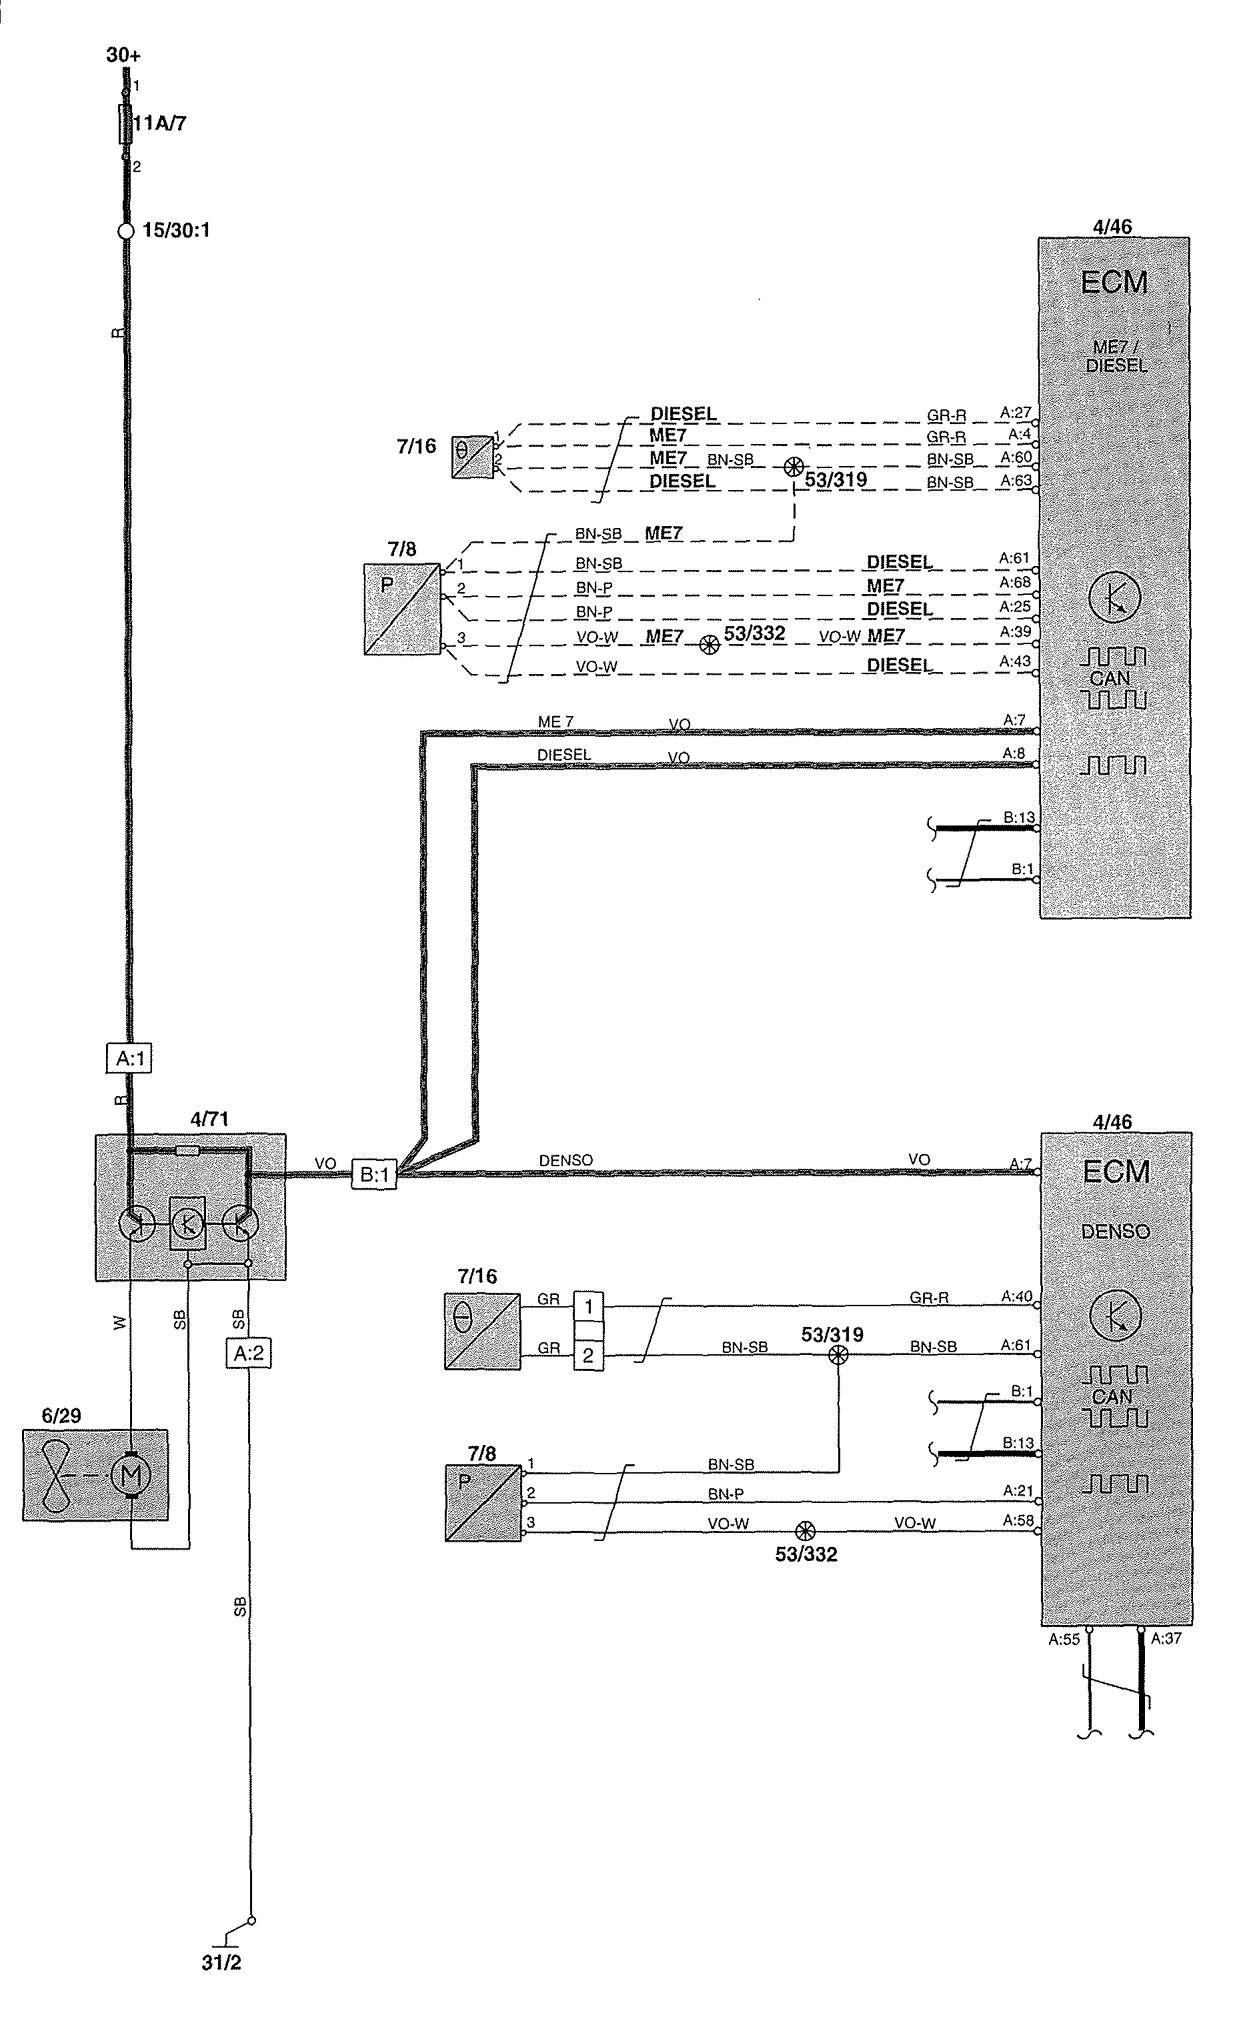 Volvo V70 Wiring Diagram - Wiring Diagrams